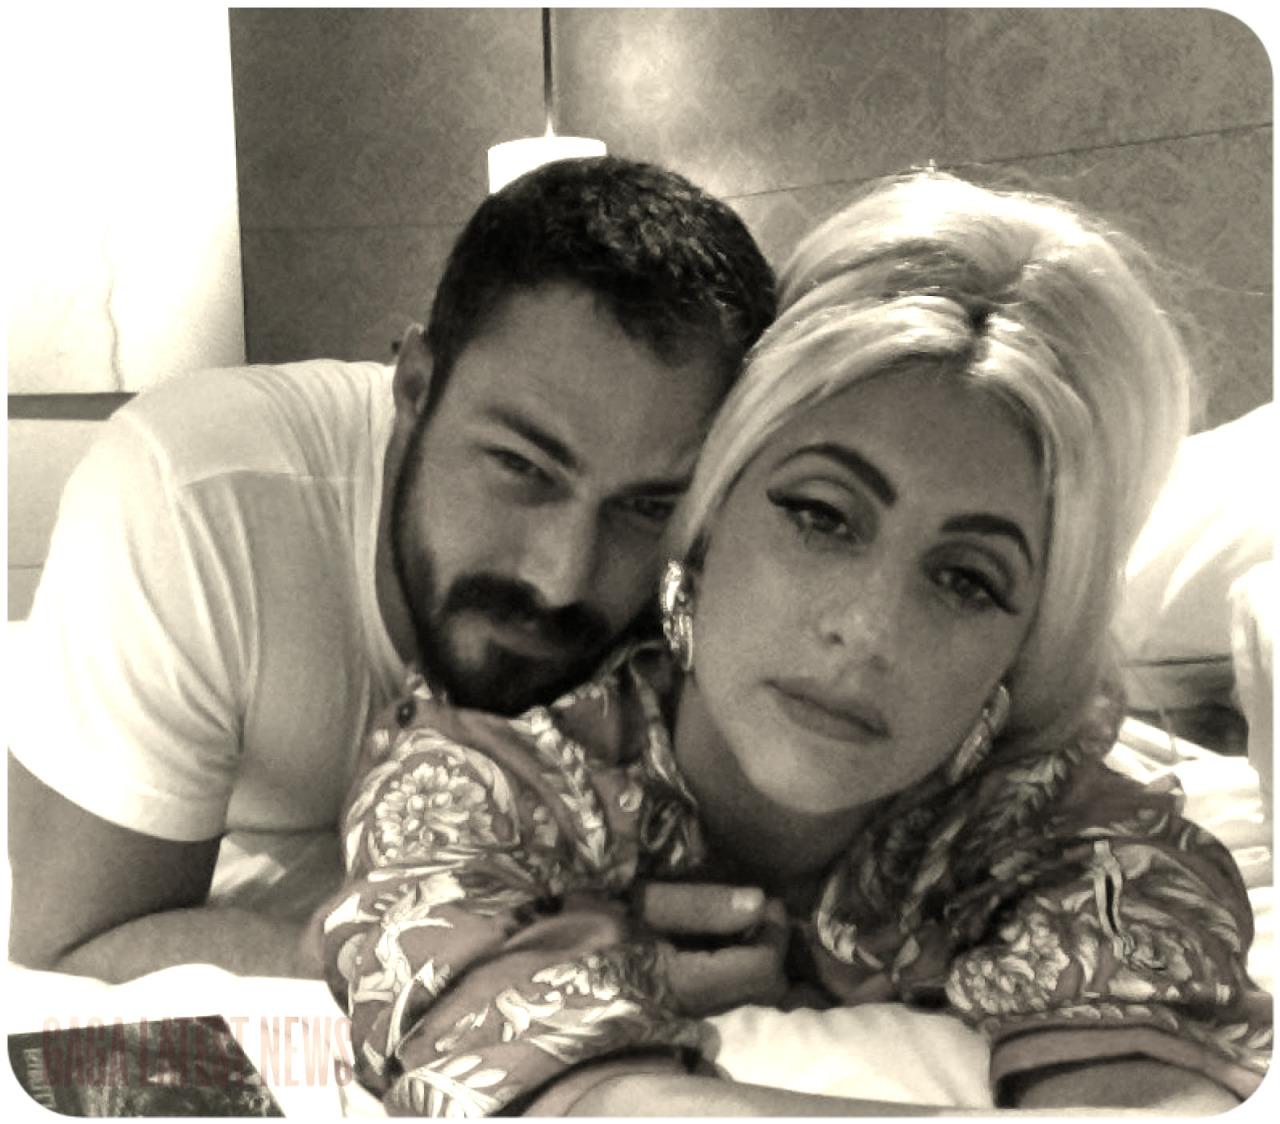 Lady Gaga and Taylor Kinney. - Page 2 Tumblr_nezue314491tq52igo1_1280